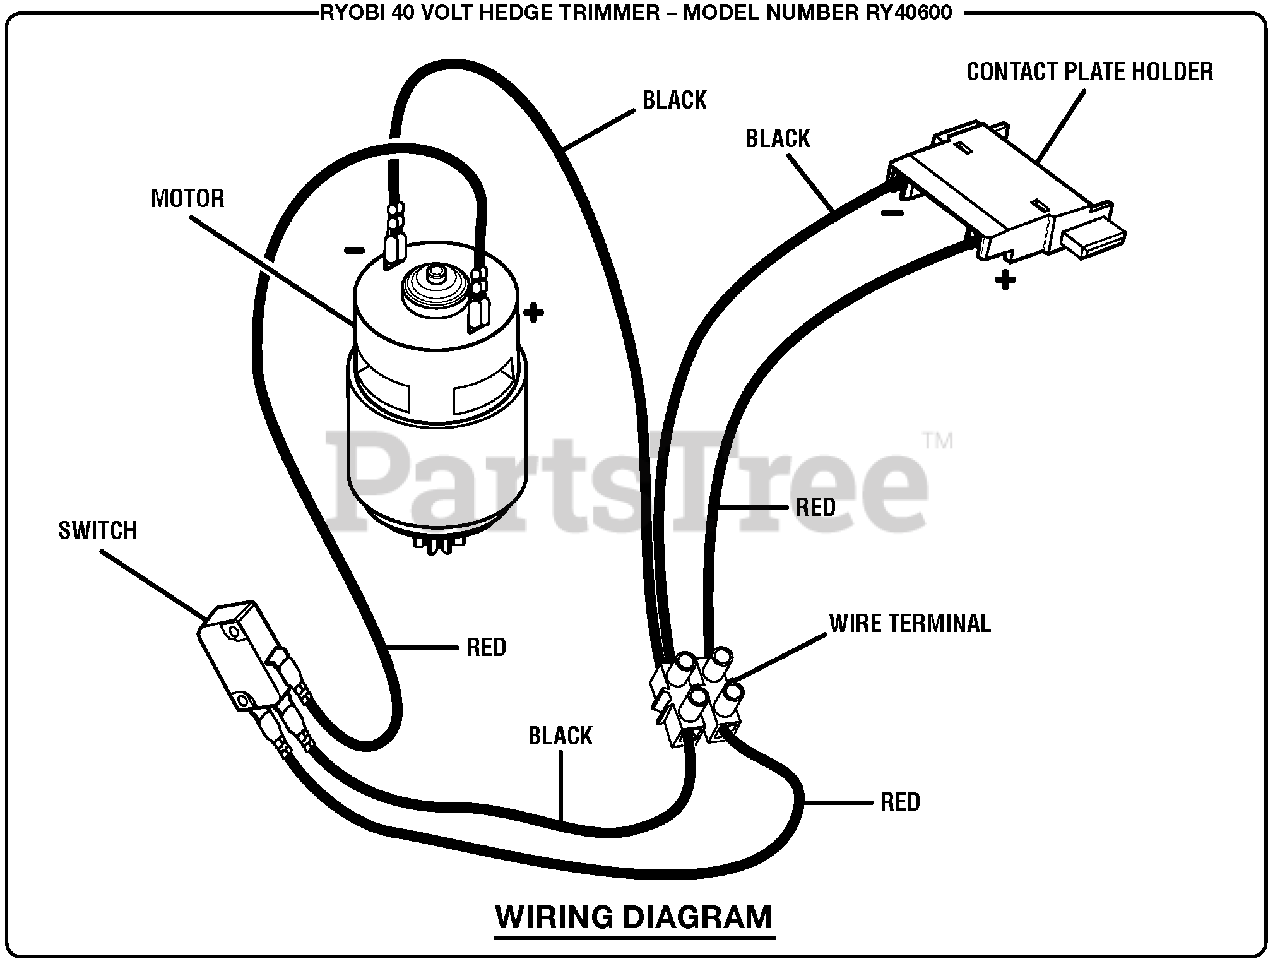 [DIAGRAM_5FD]  Ryobi RY 40600 - Ryobi Hedge Trimmer, 40 Volt Wiring Diagram Parts Lookup  with Diagrams | PartsTree | Trimmer Wiring Diagram |  | PartsTree